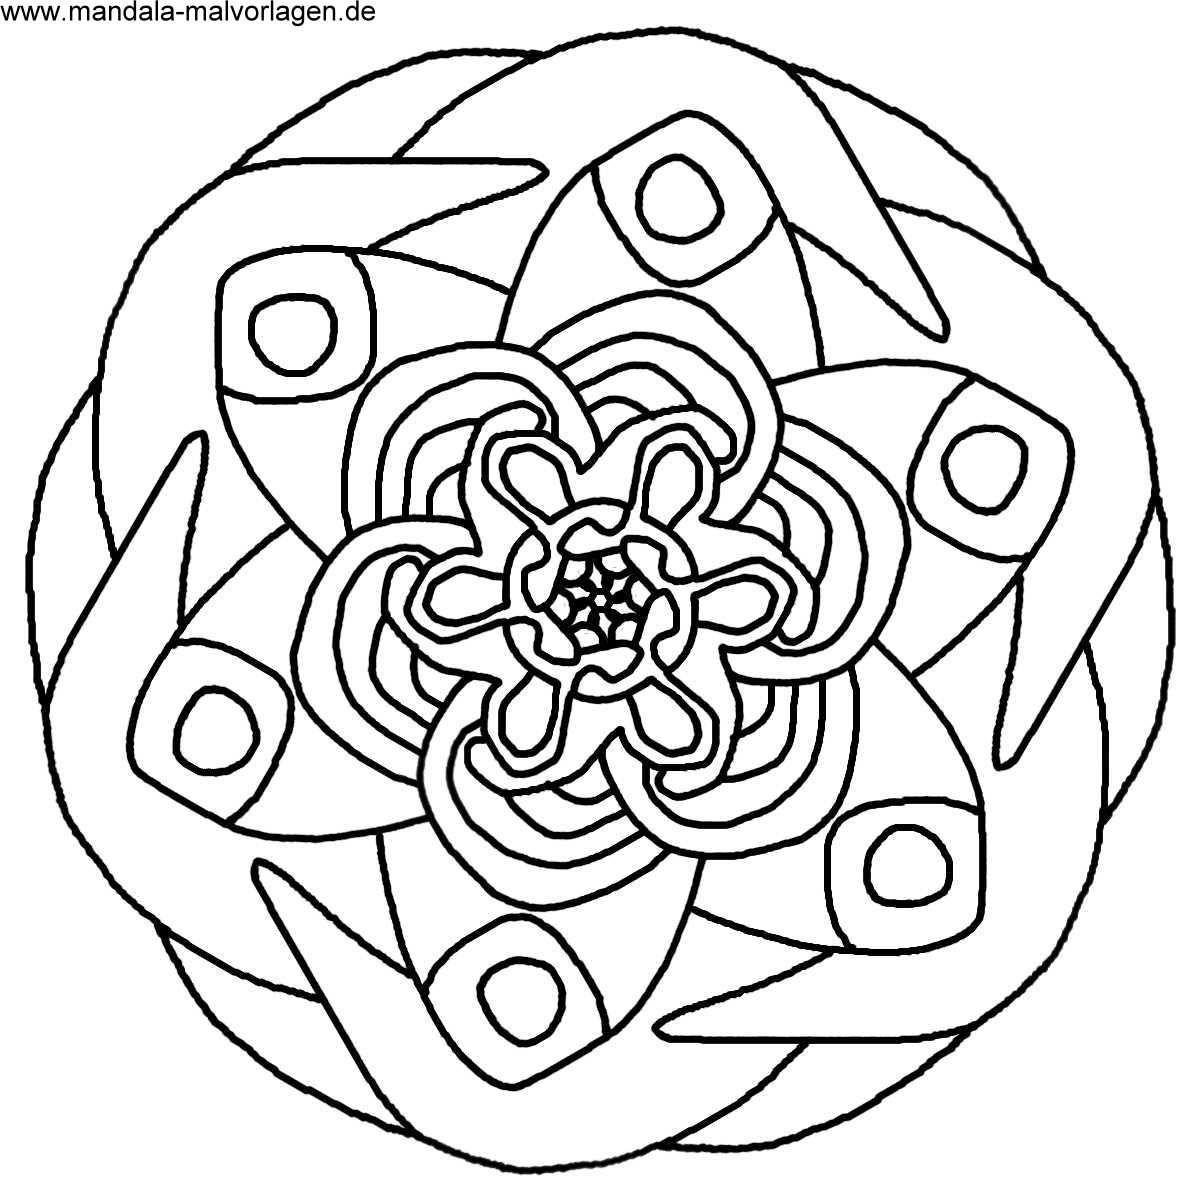 Ausmalbilder Mandala,Ausmalbilder Mandalas   Ausmalbilder ...